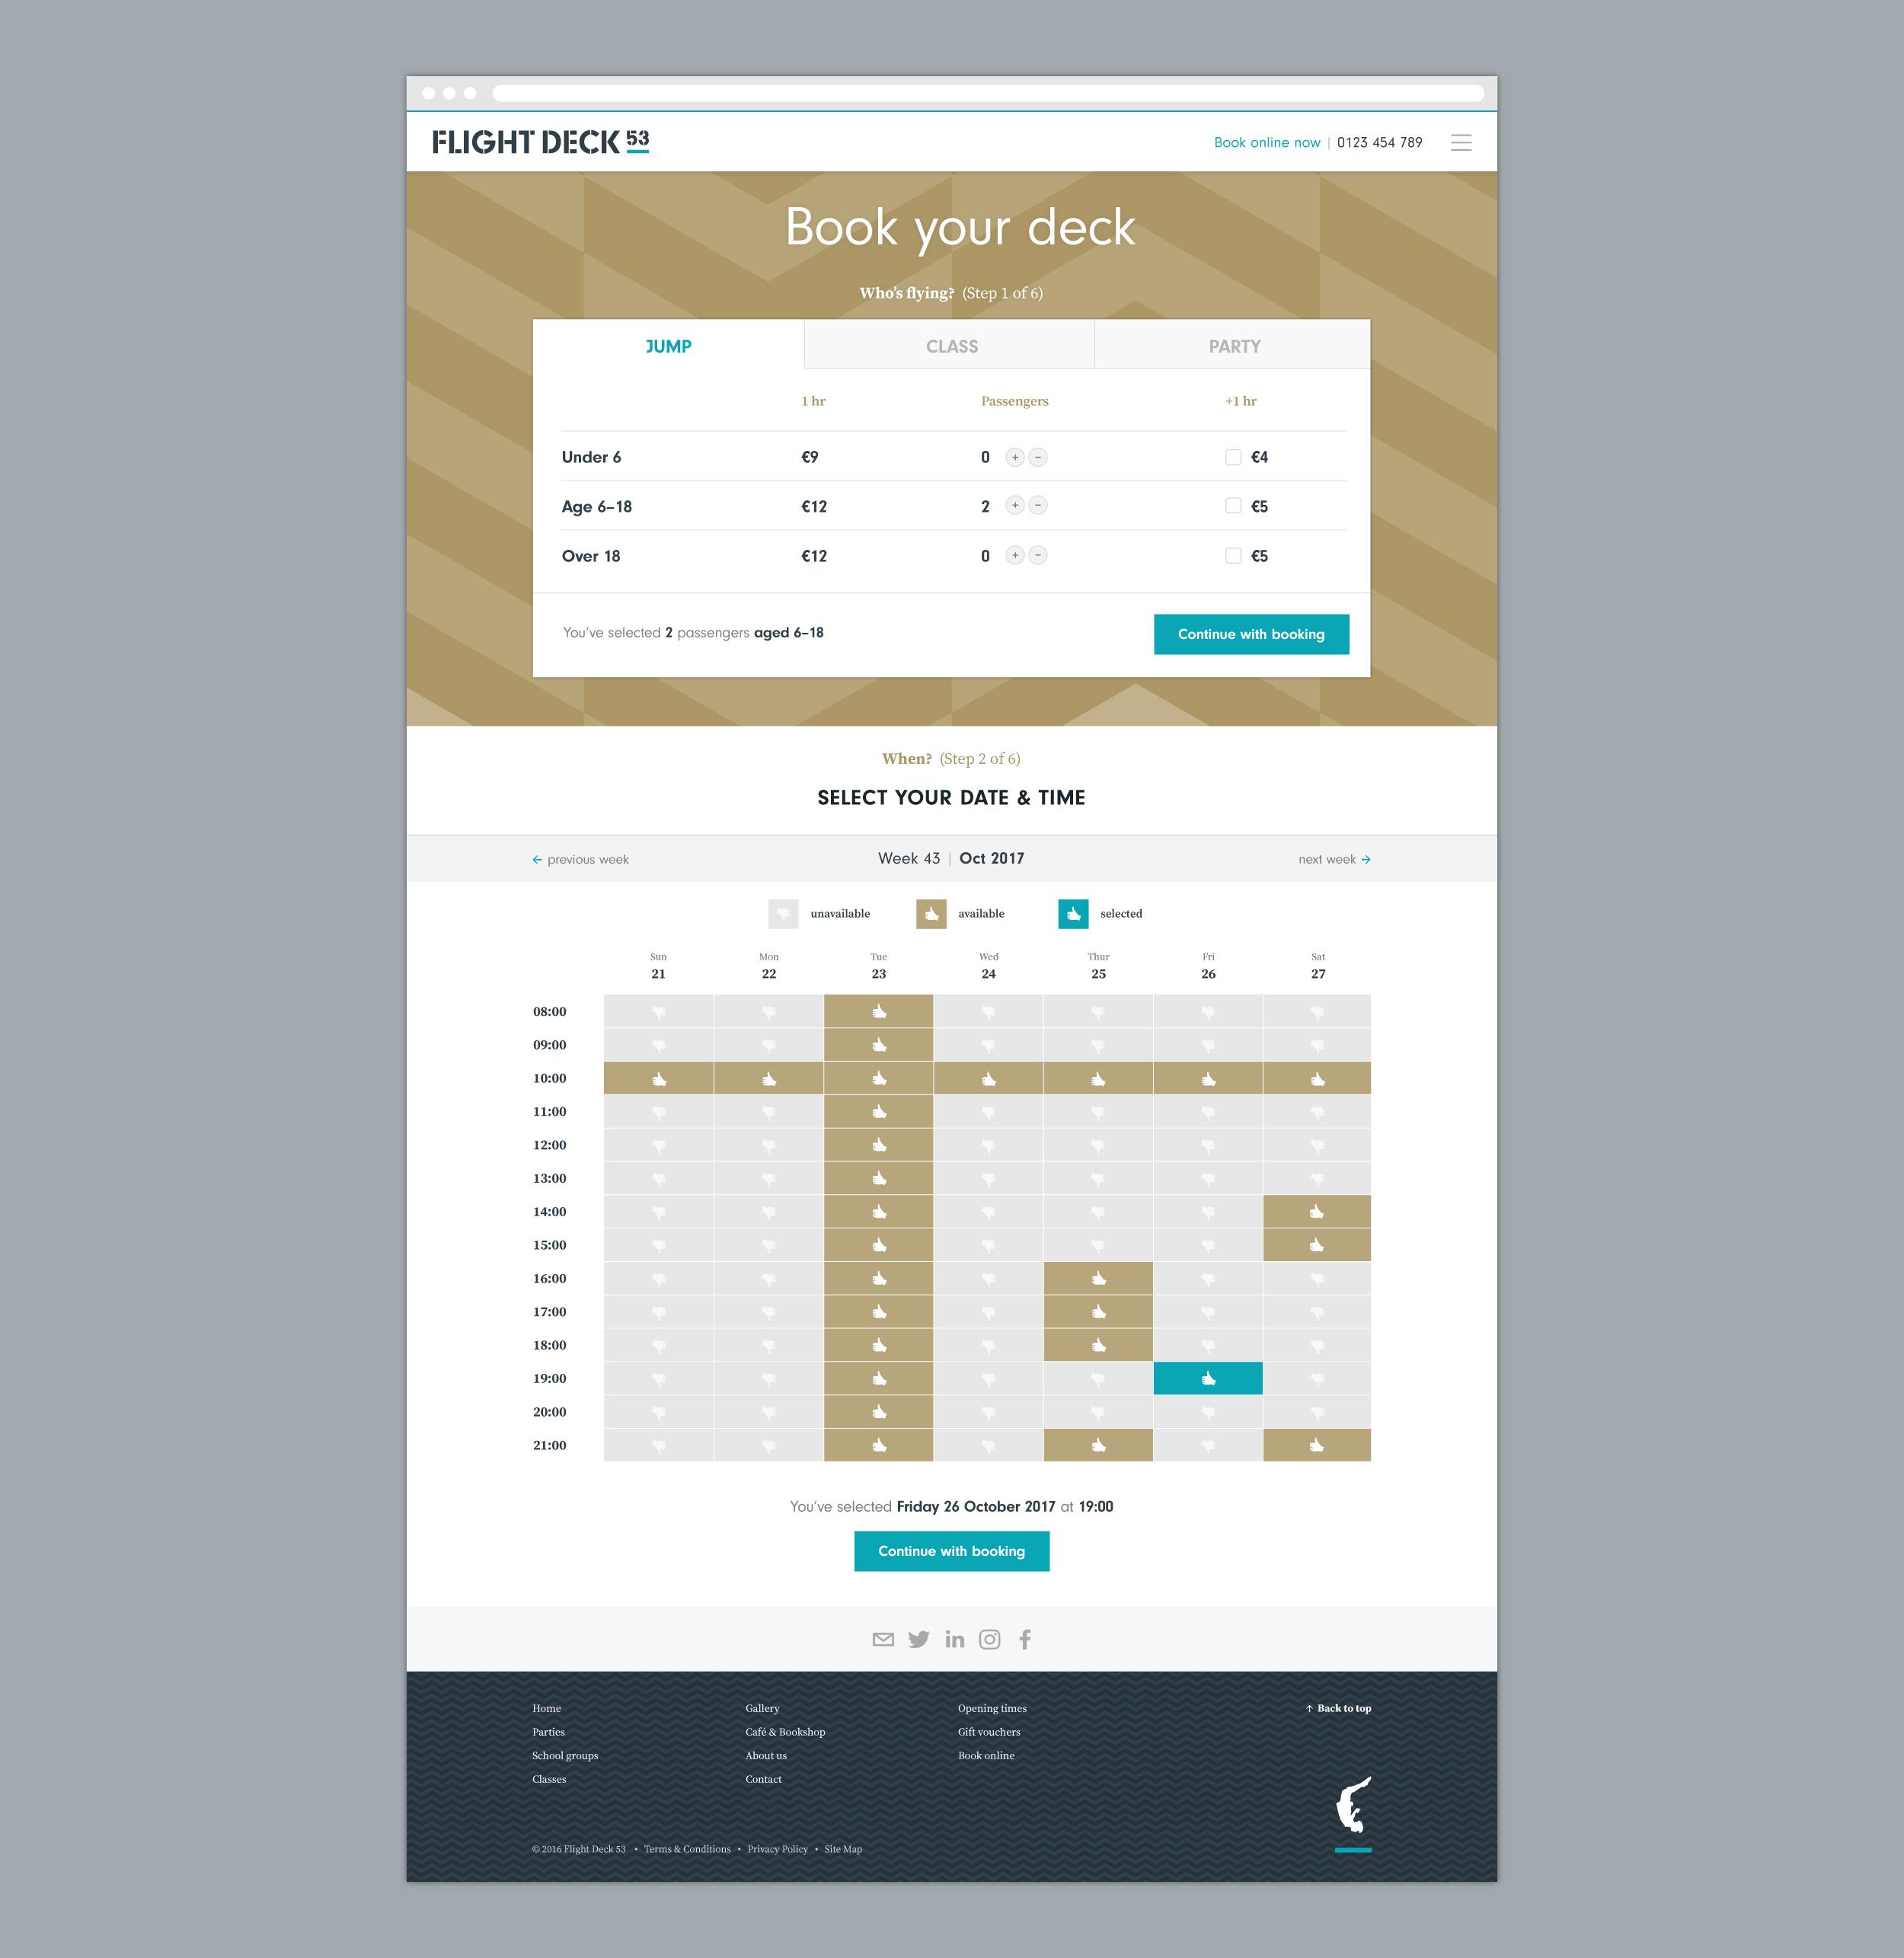 Flight Deck 53 website design visual – Design by Ian Whalley